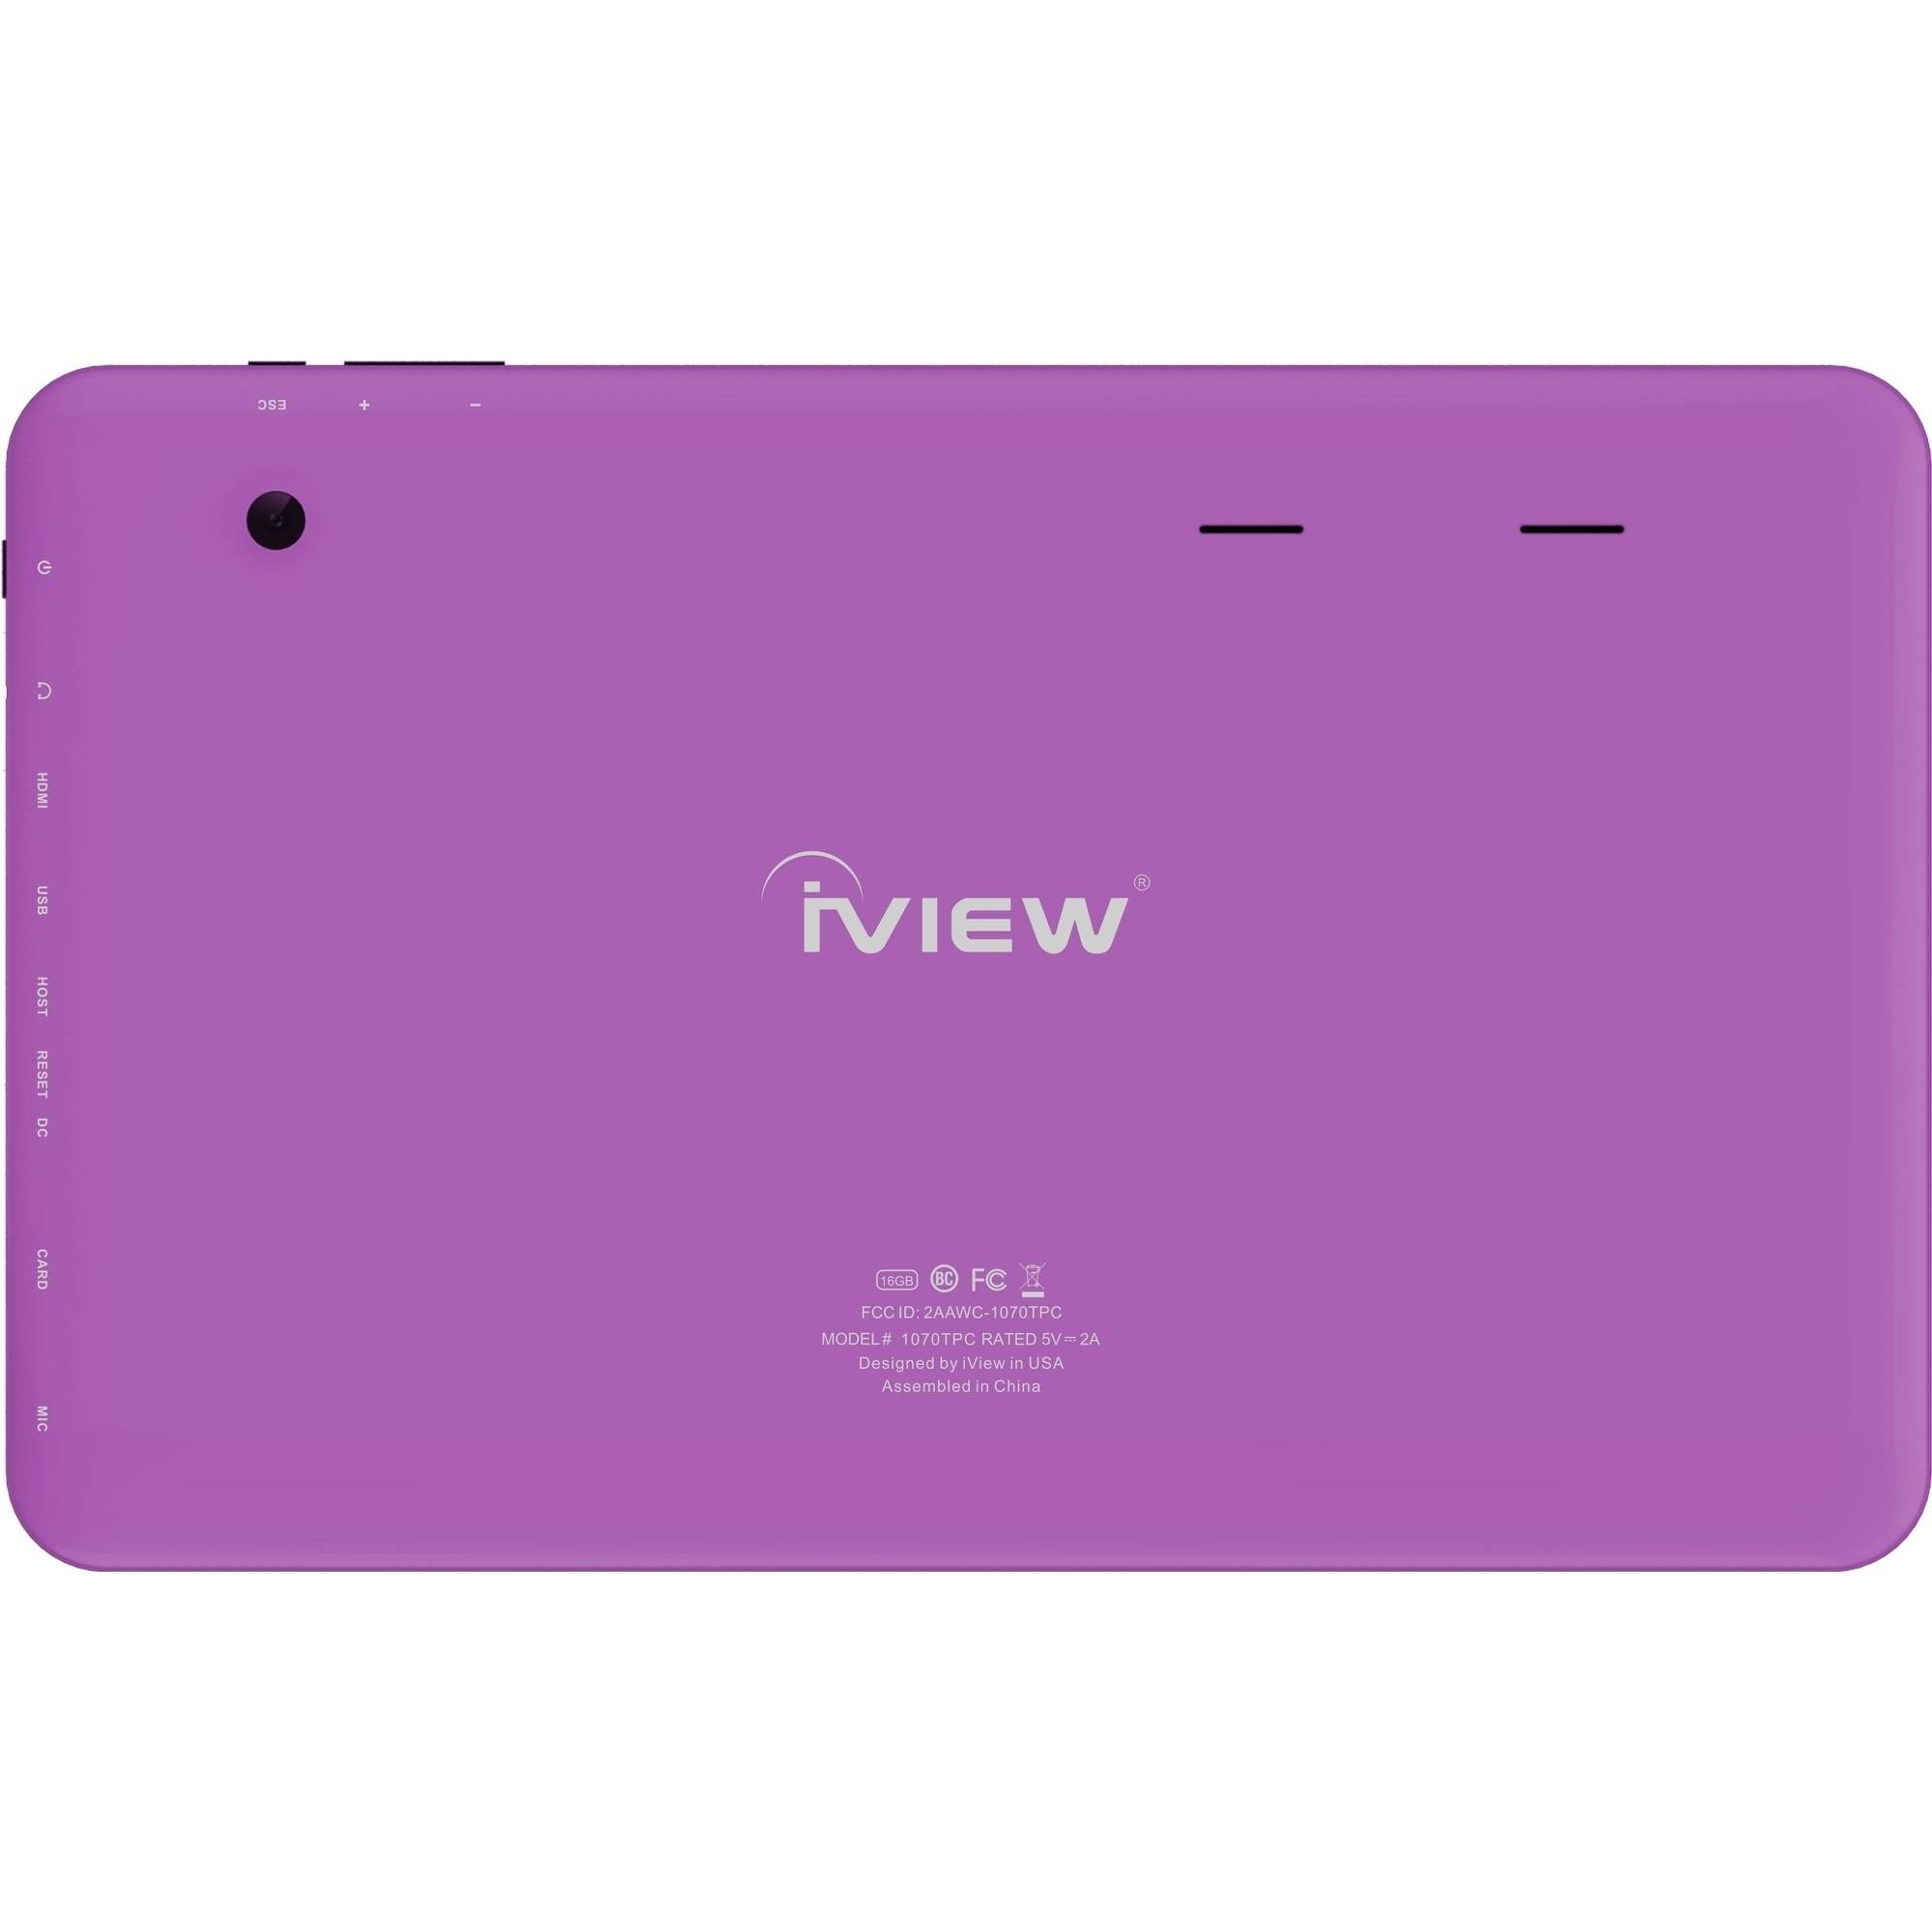 iView SupraPad with WiFi 10 1